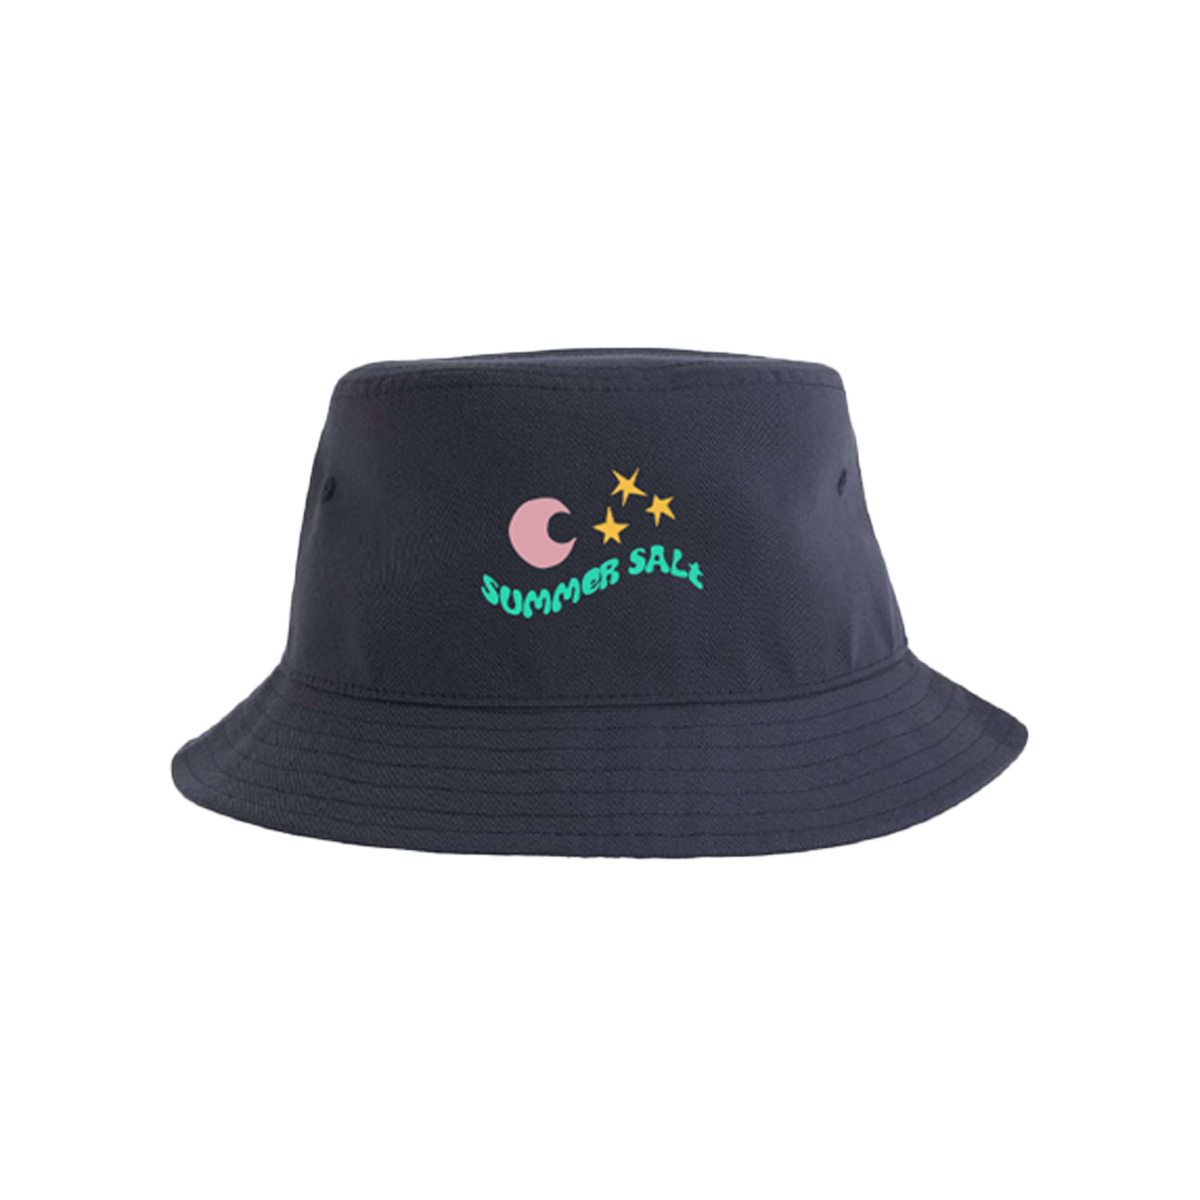 Sequoia Moon Hat